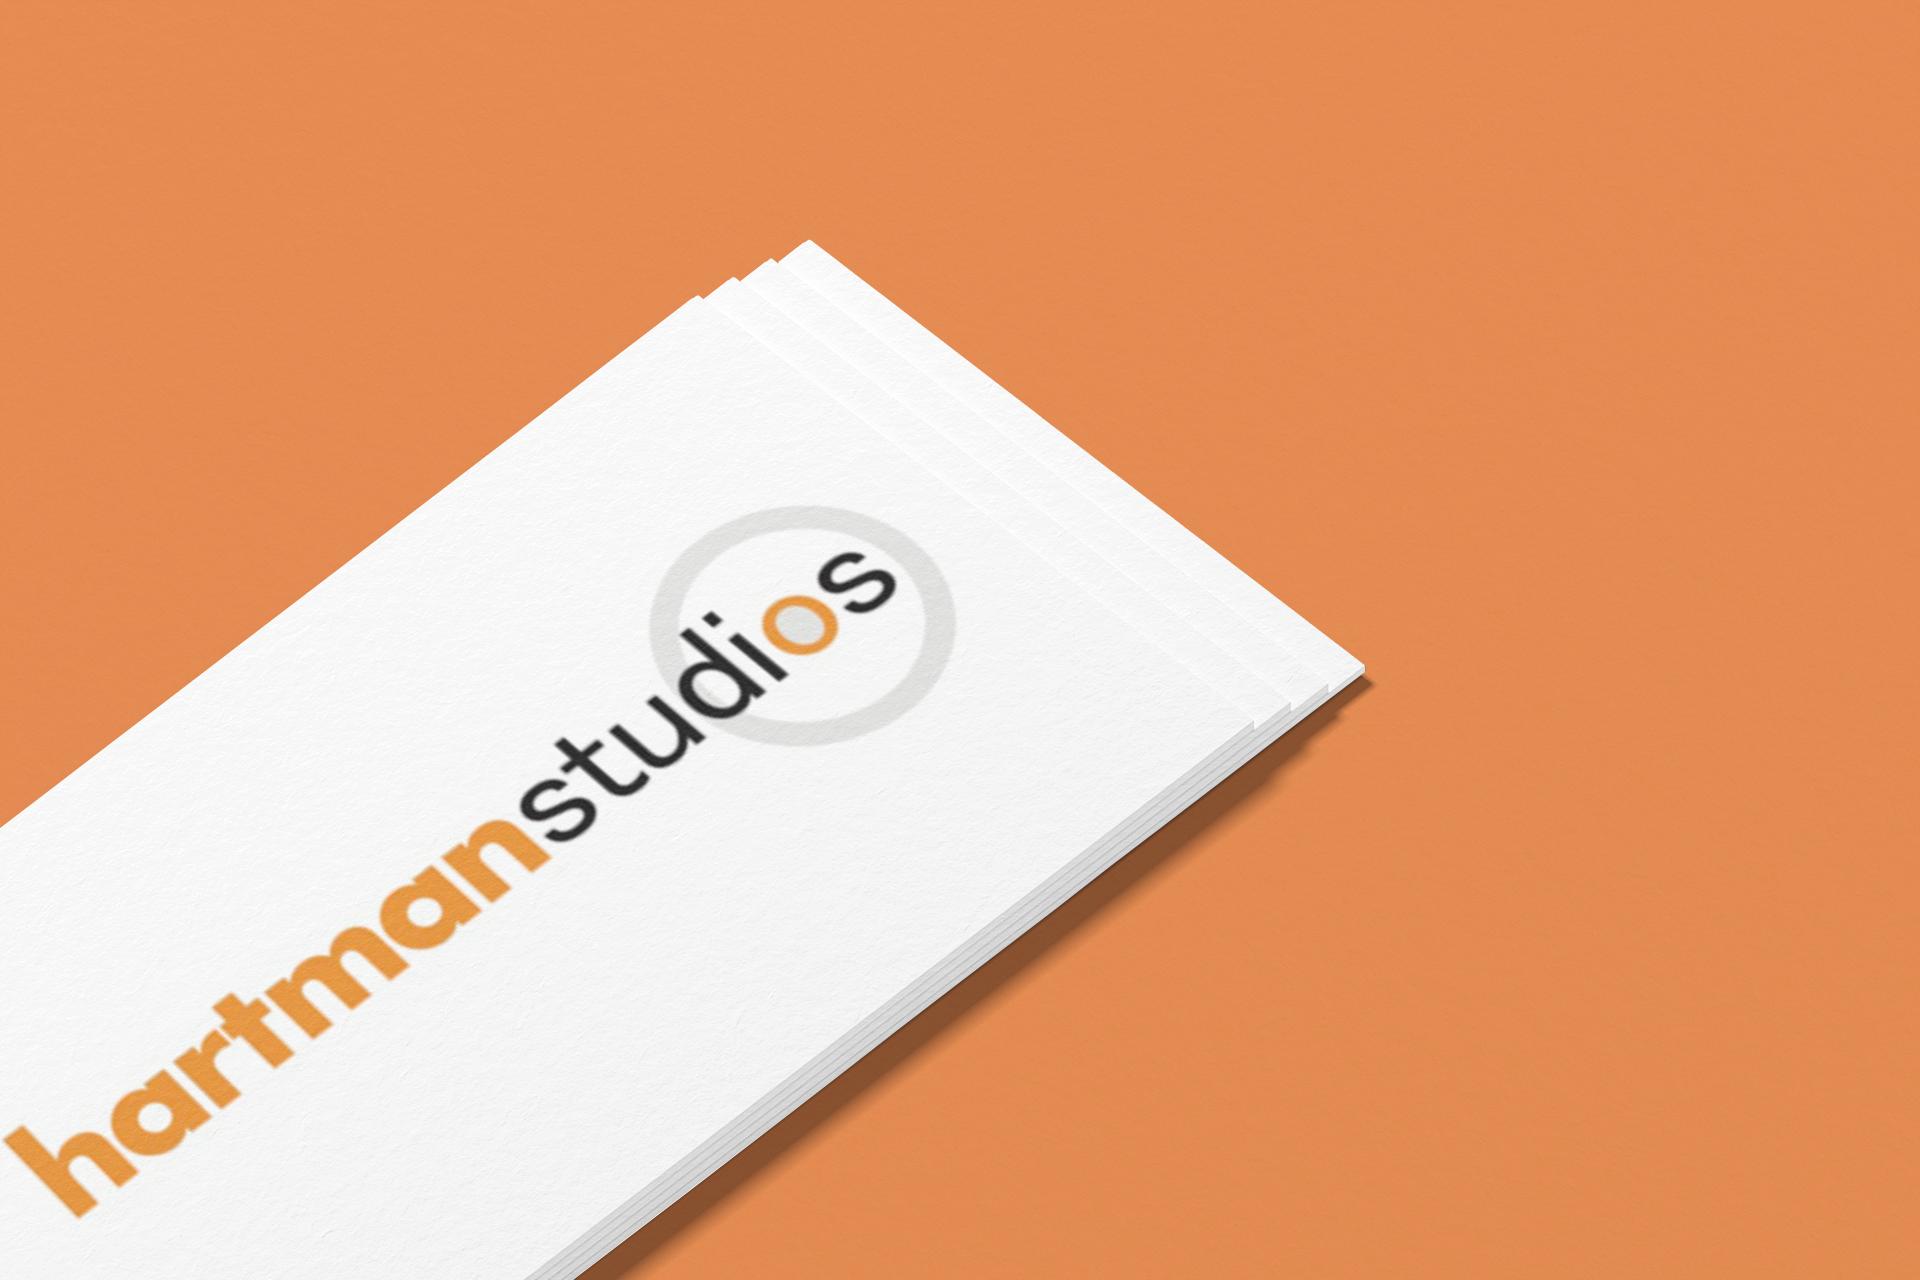 hartman studios logo mockup